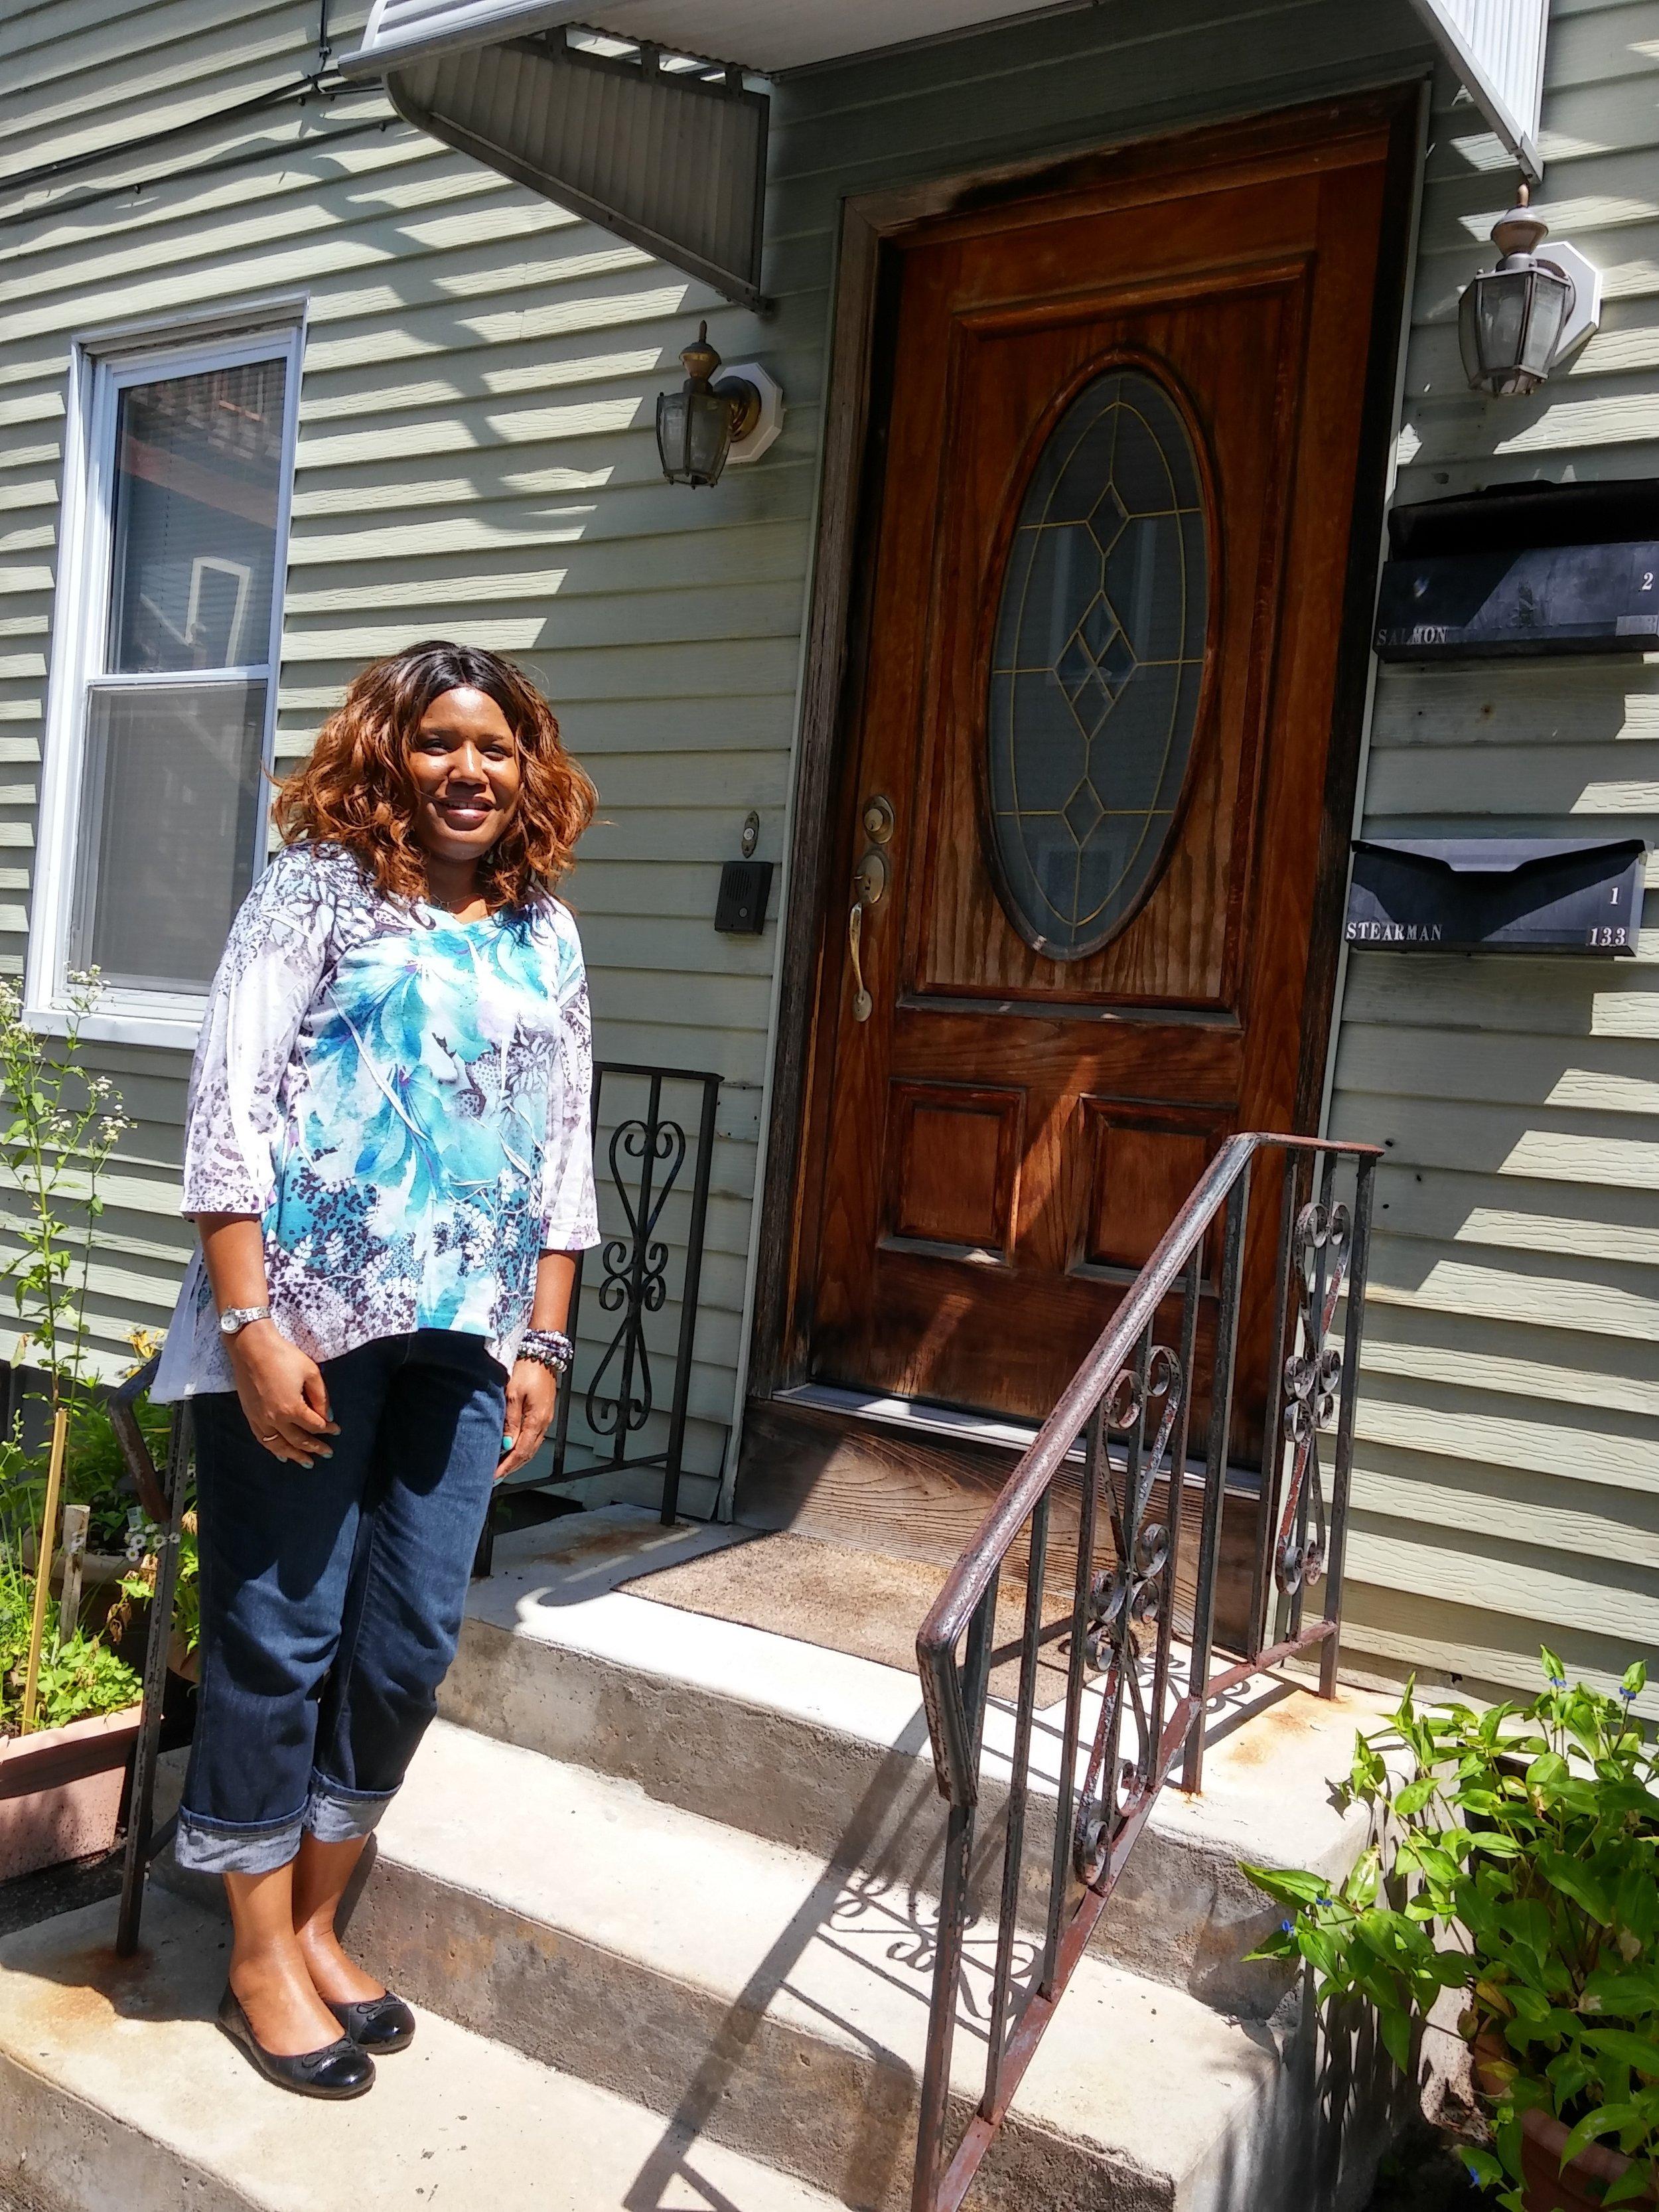 Pine Street happy homeowner